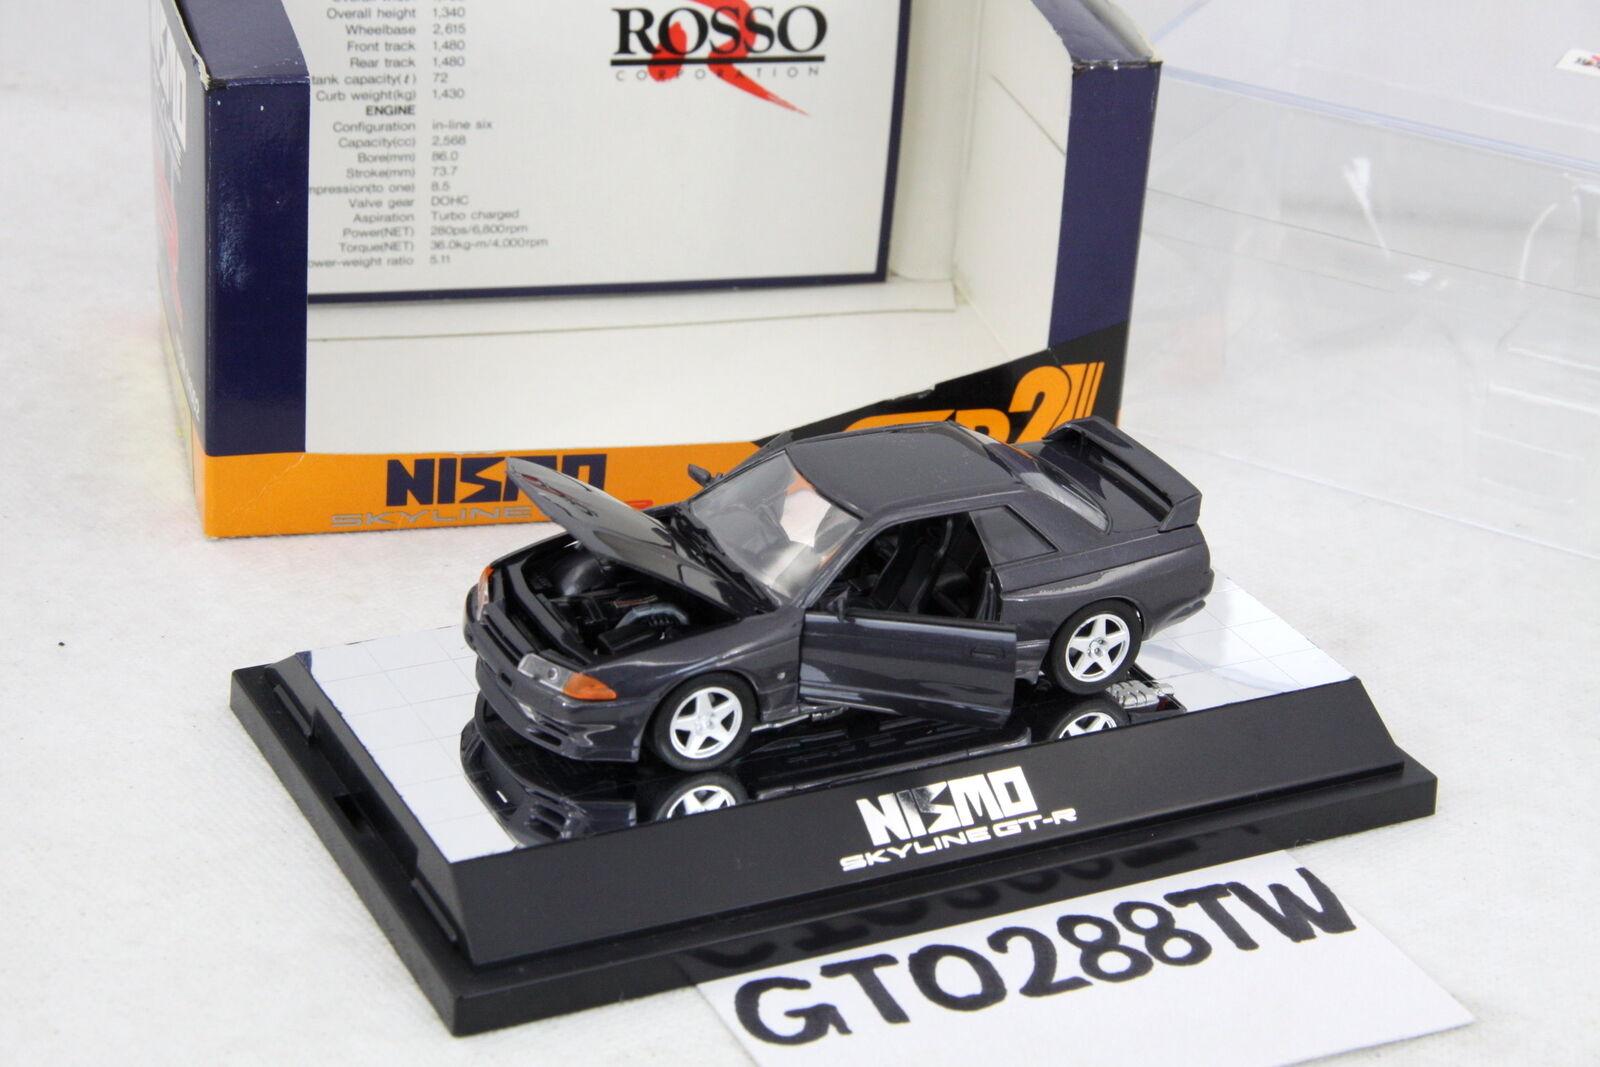 rojo 1 43 escala Nismo Nissan Skyline Skyline Skyline R32 GT-R 1990 Gun Metal (con Motor apertura) de56fa